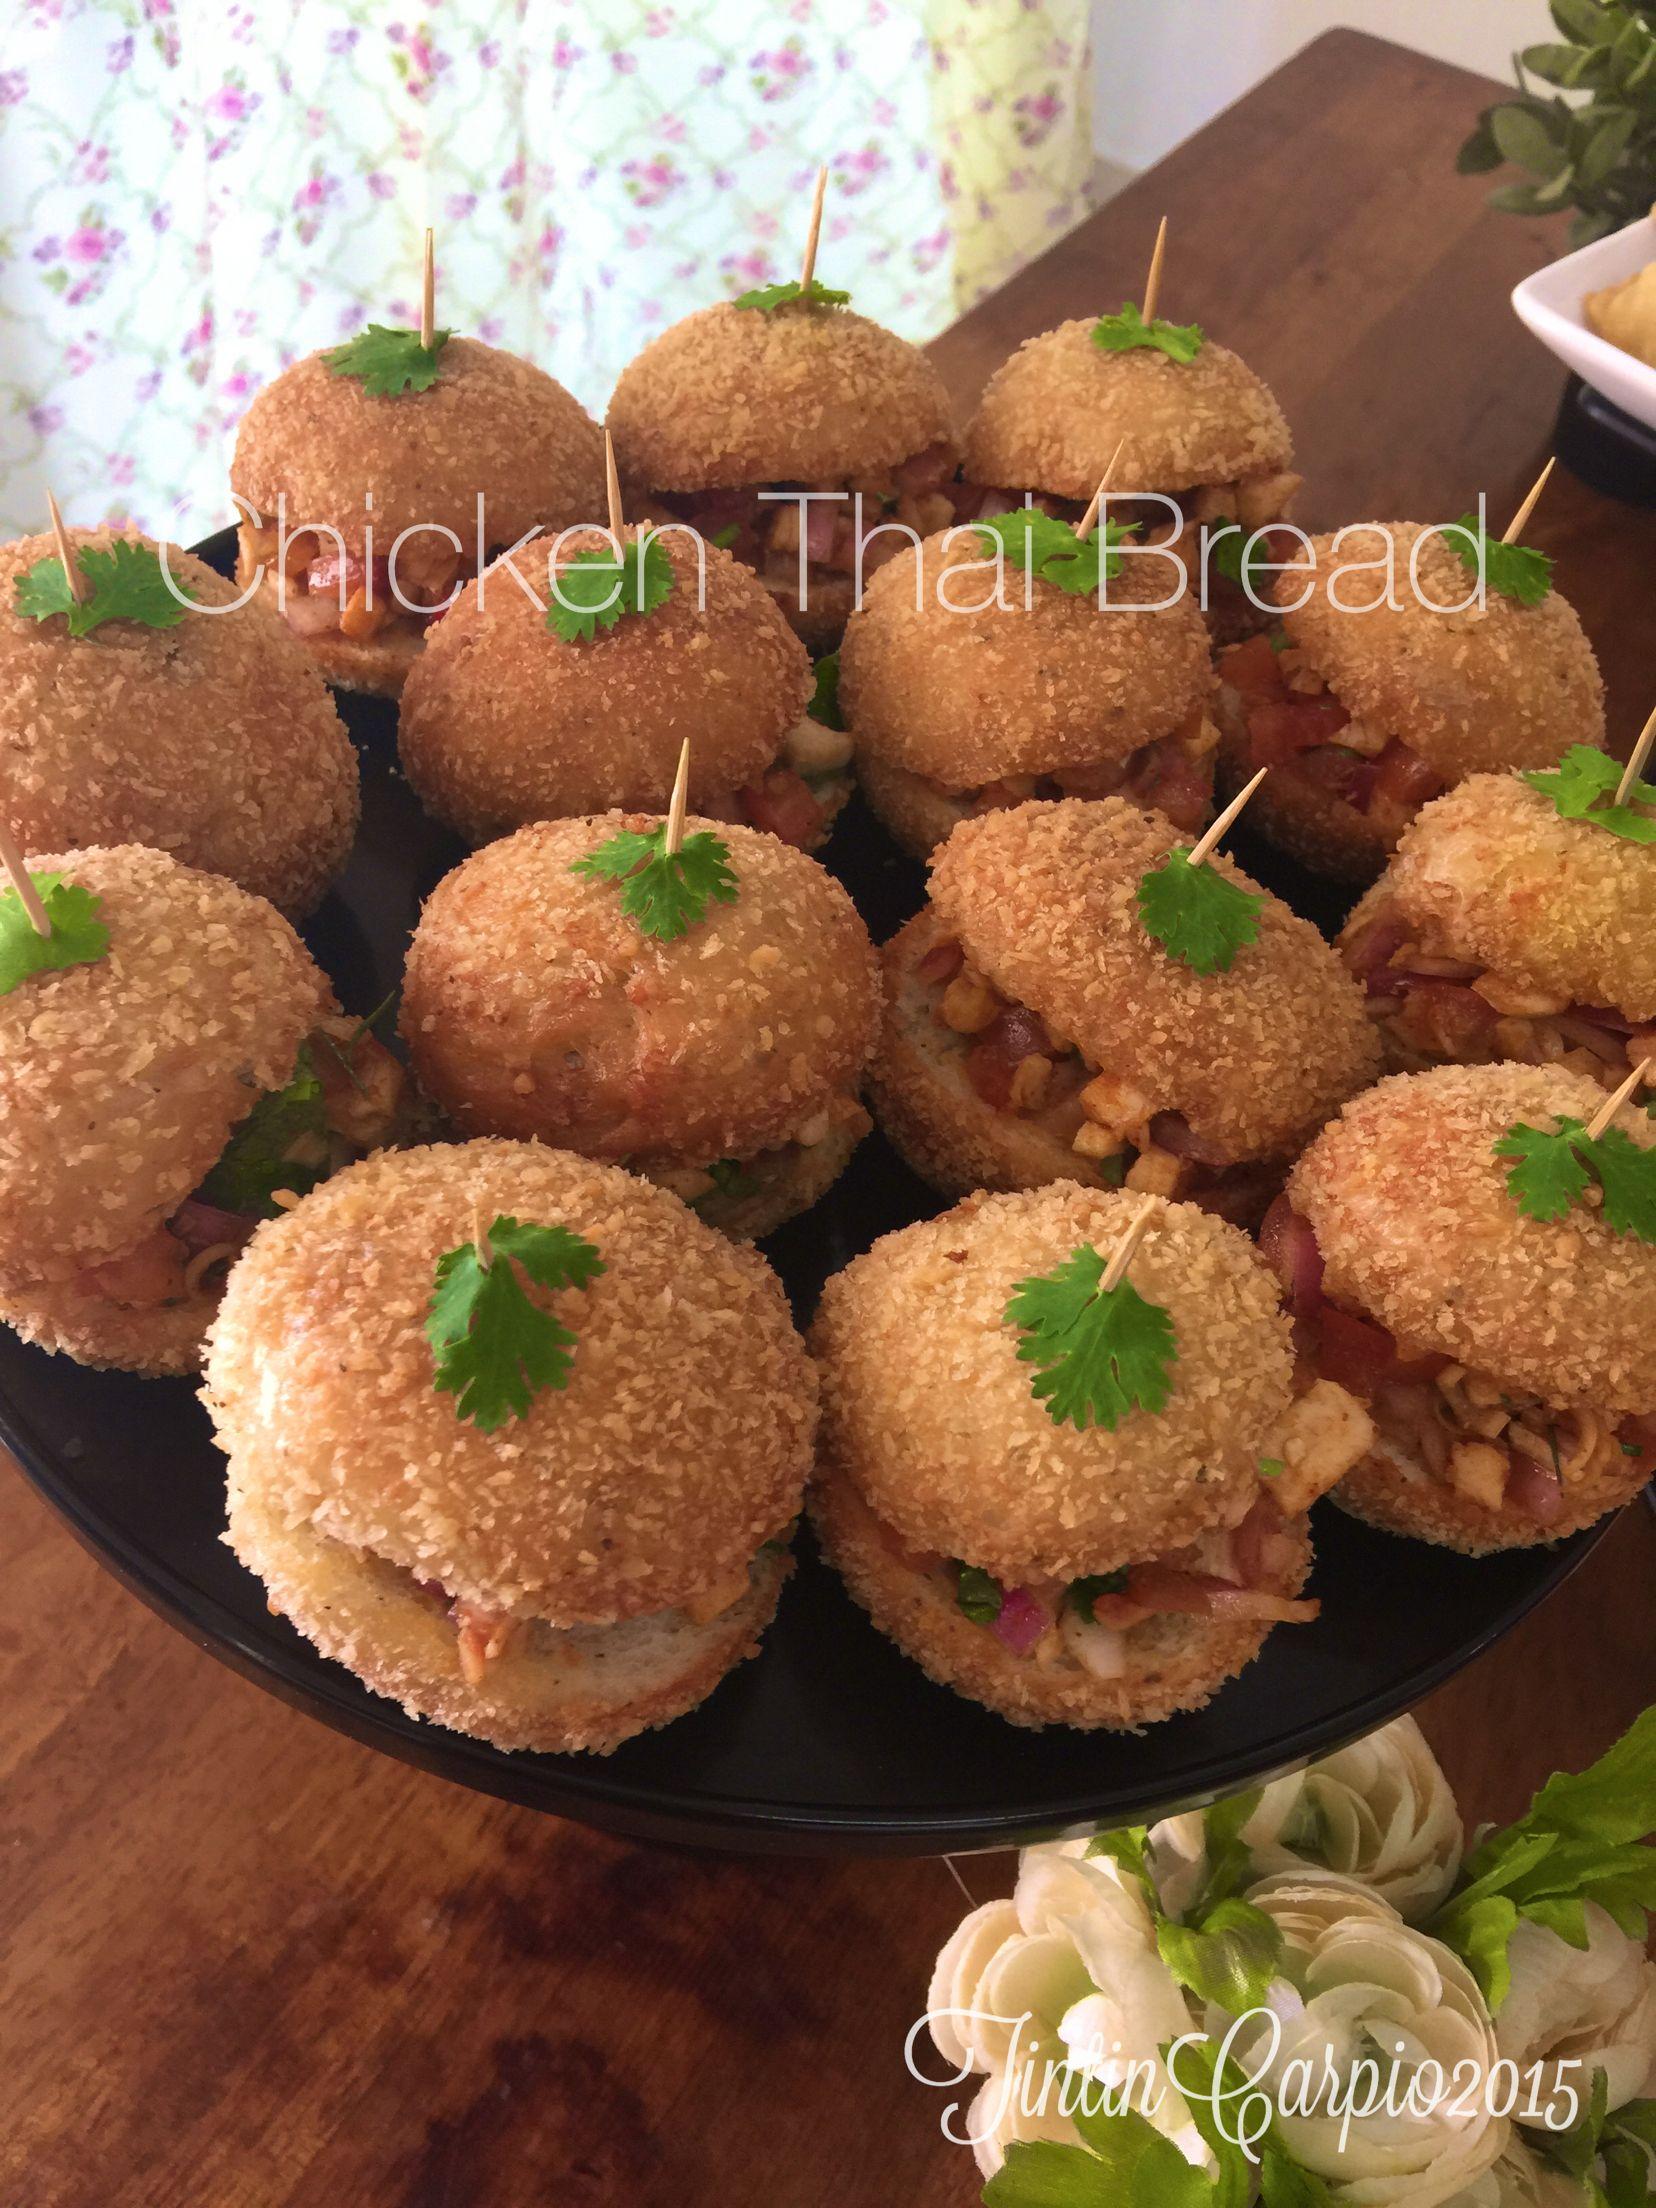 Chicken Thai Bread Resep Roti Resep Masakan Resep